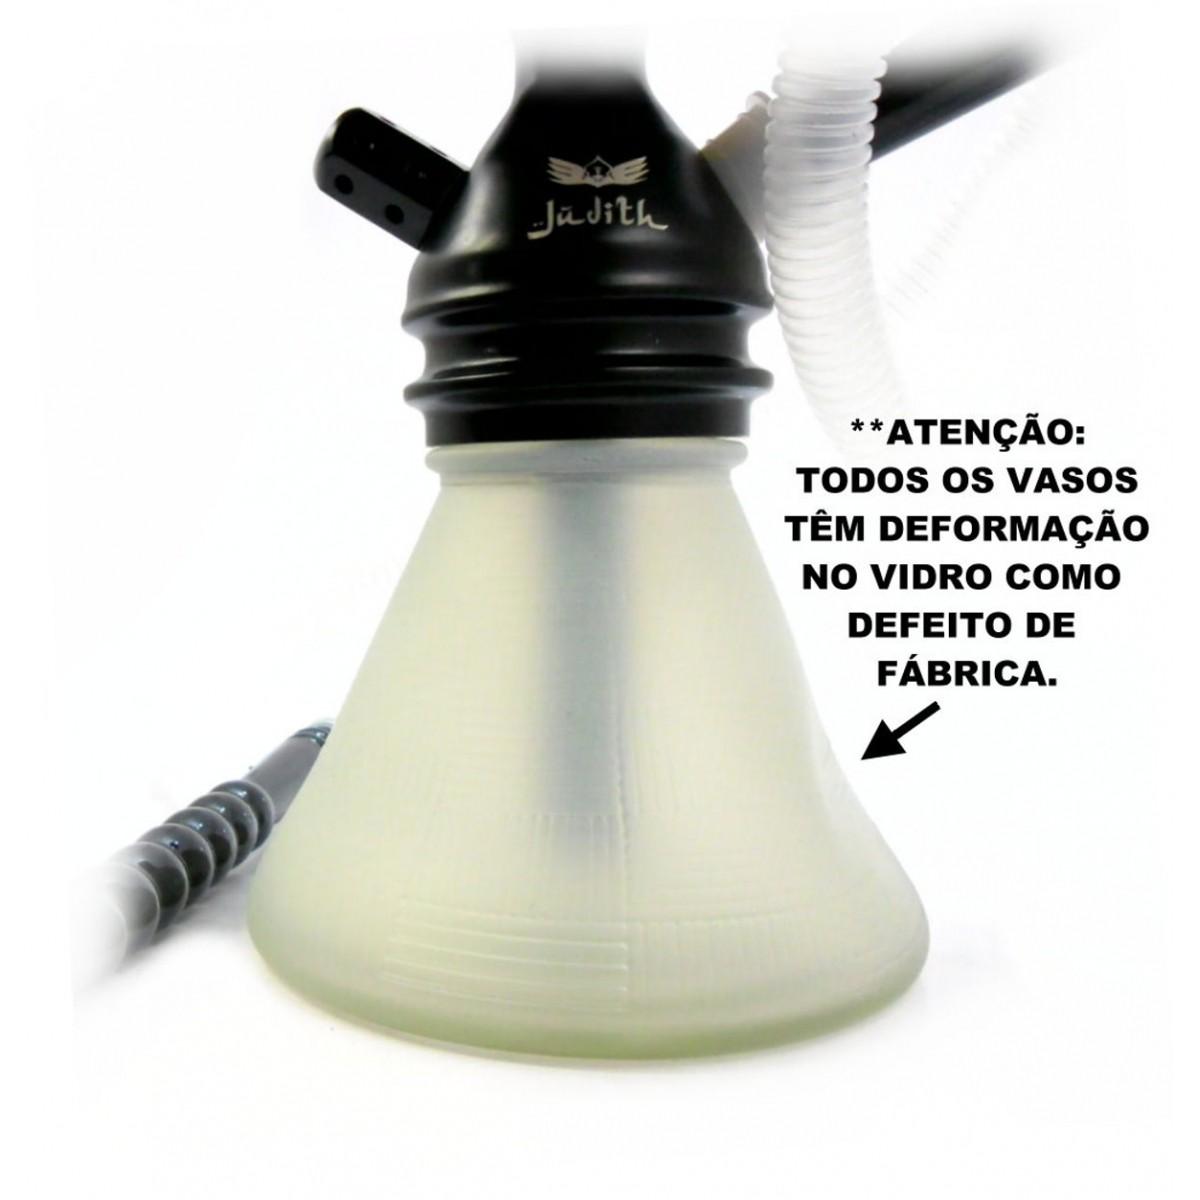 Narguile JUDITH ROSA 33cm, vaso petit BRANCO, mangueira MD HOSE VERMELHA, fornilho FUNIL, prato VENNUS ROSA/CROMADO.